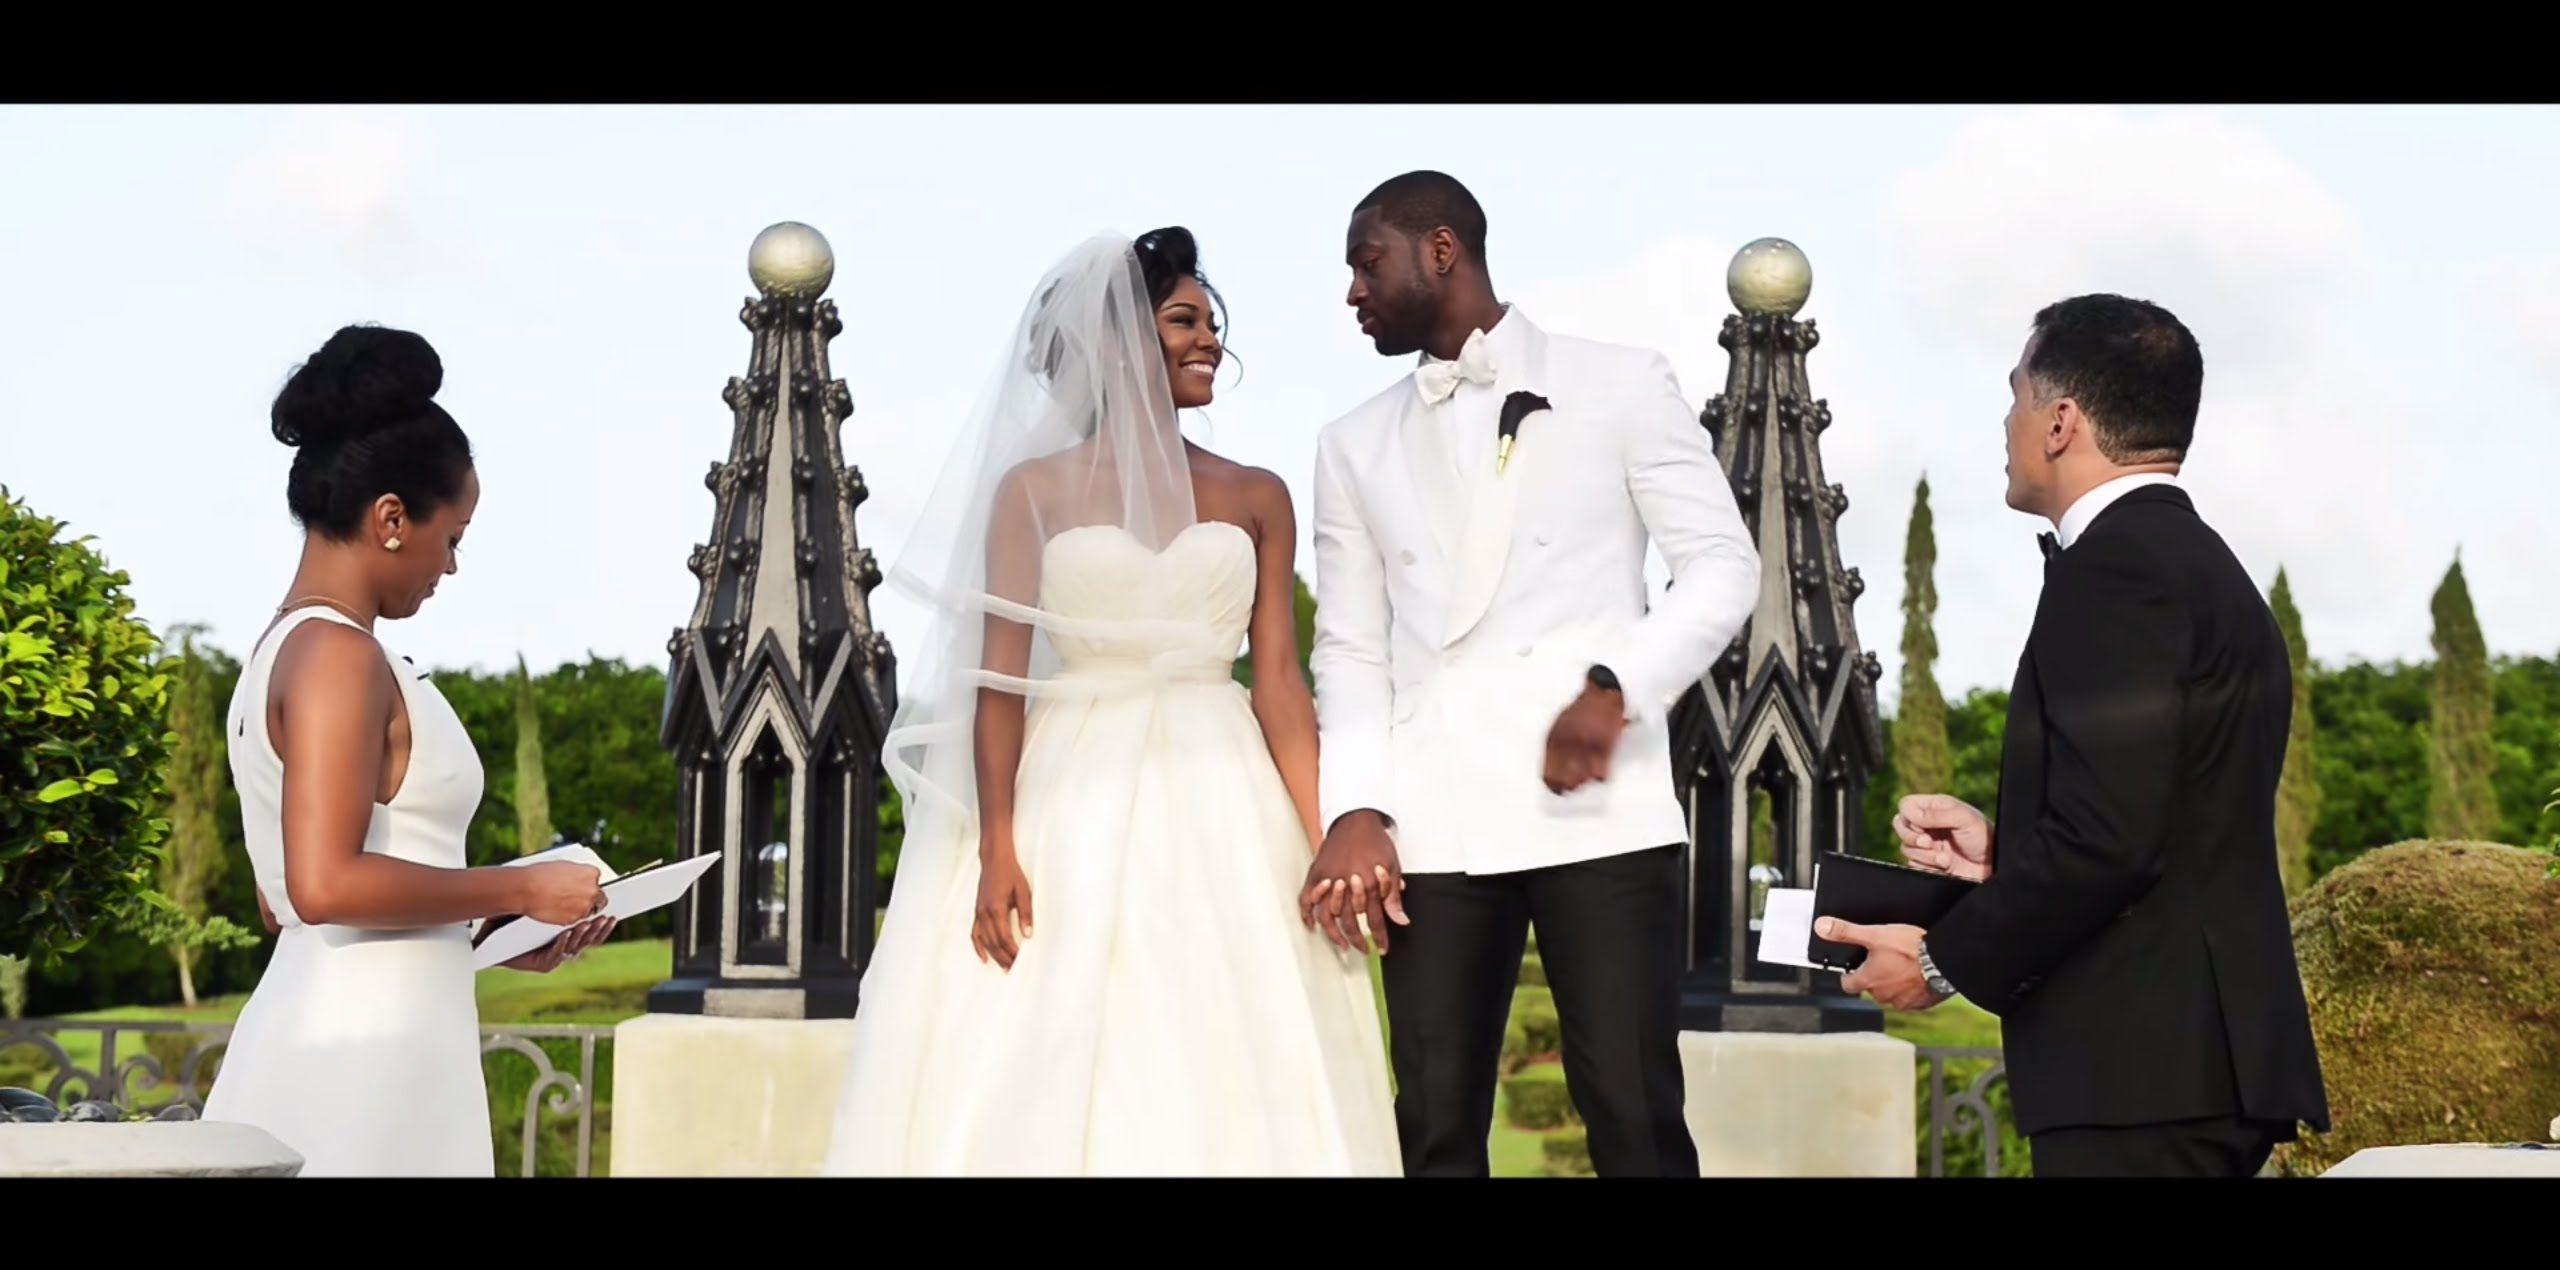 Gabrielle and dwyane wade full wedding video cinematography tips gabrielle and dwyane wade full wedding video junglespirit Choice Image